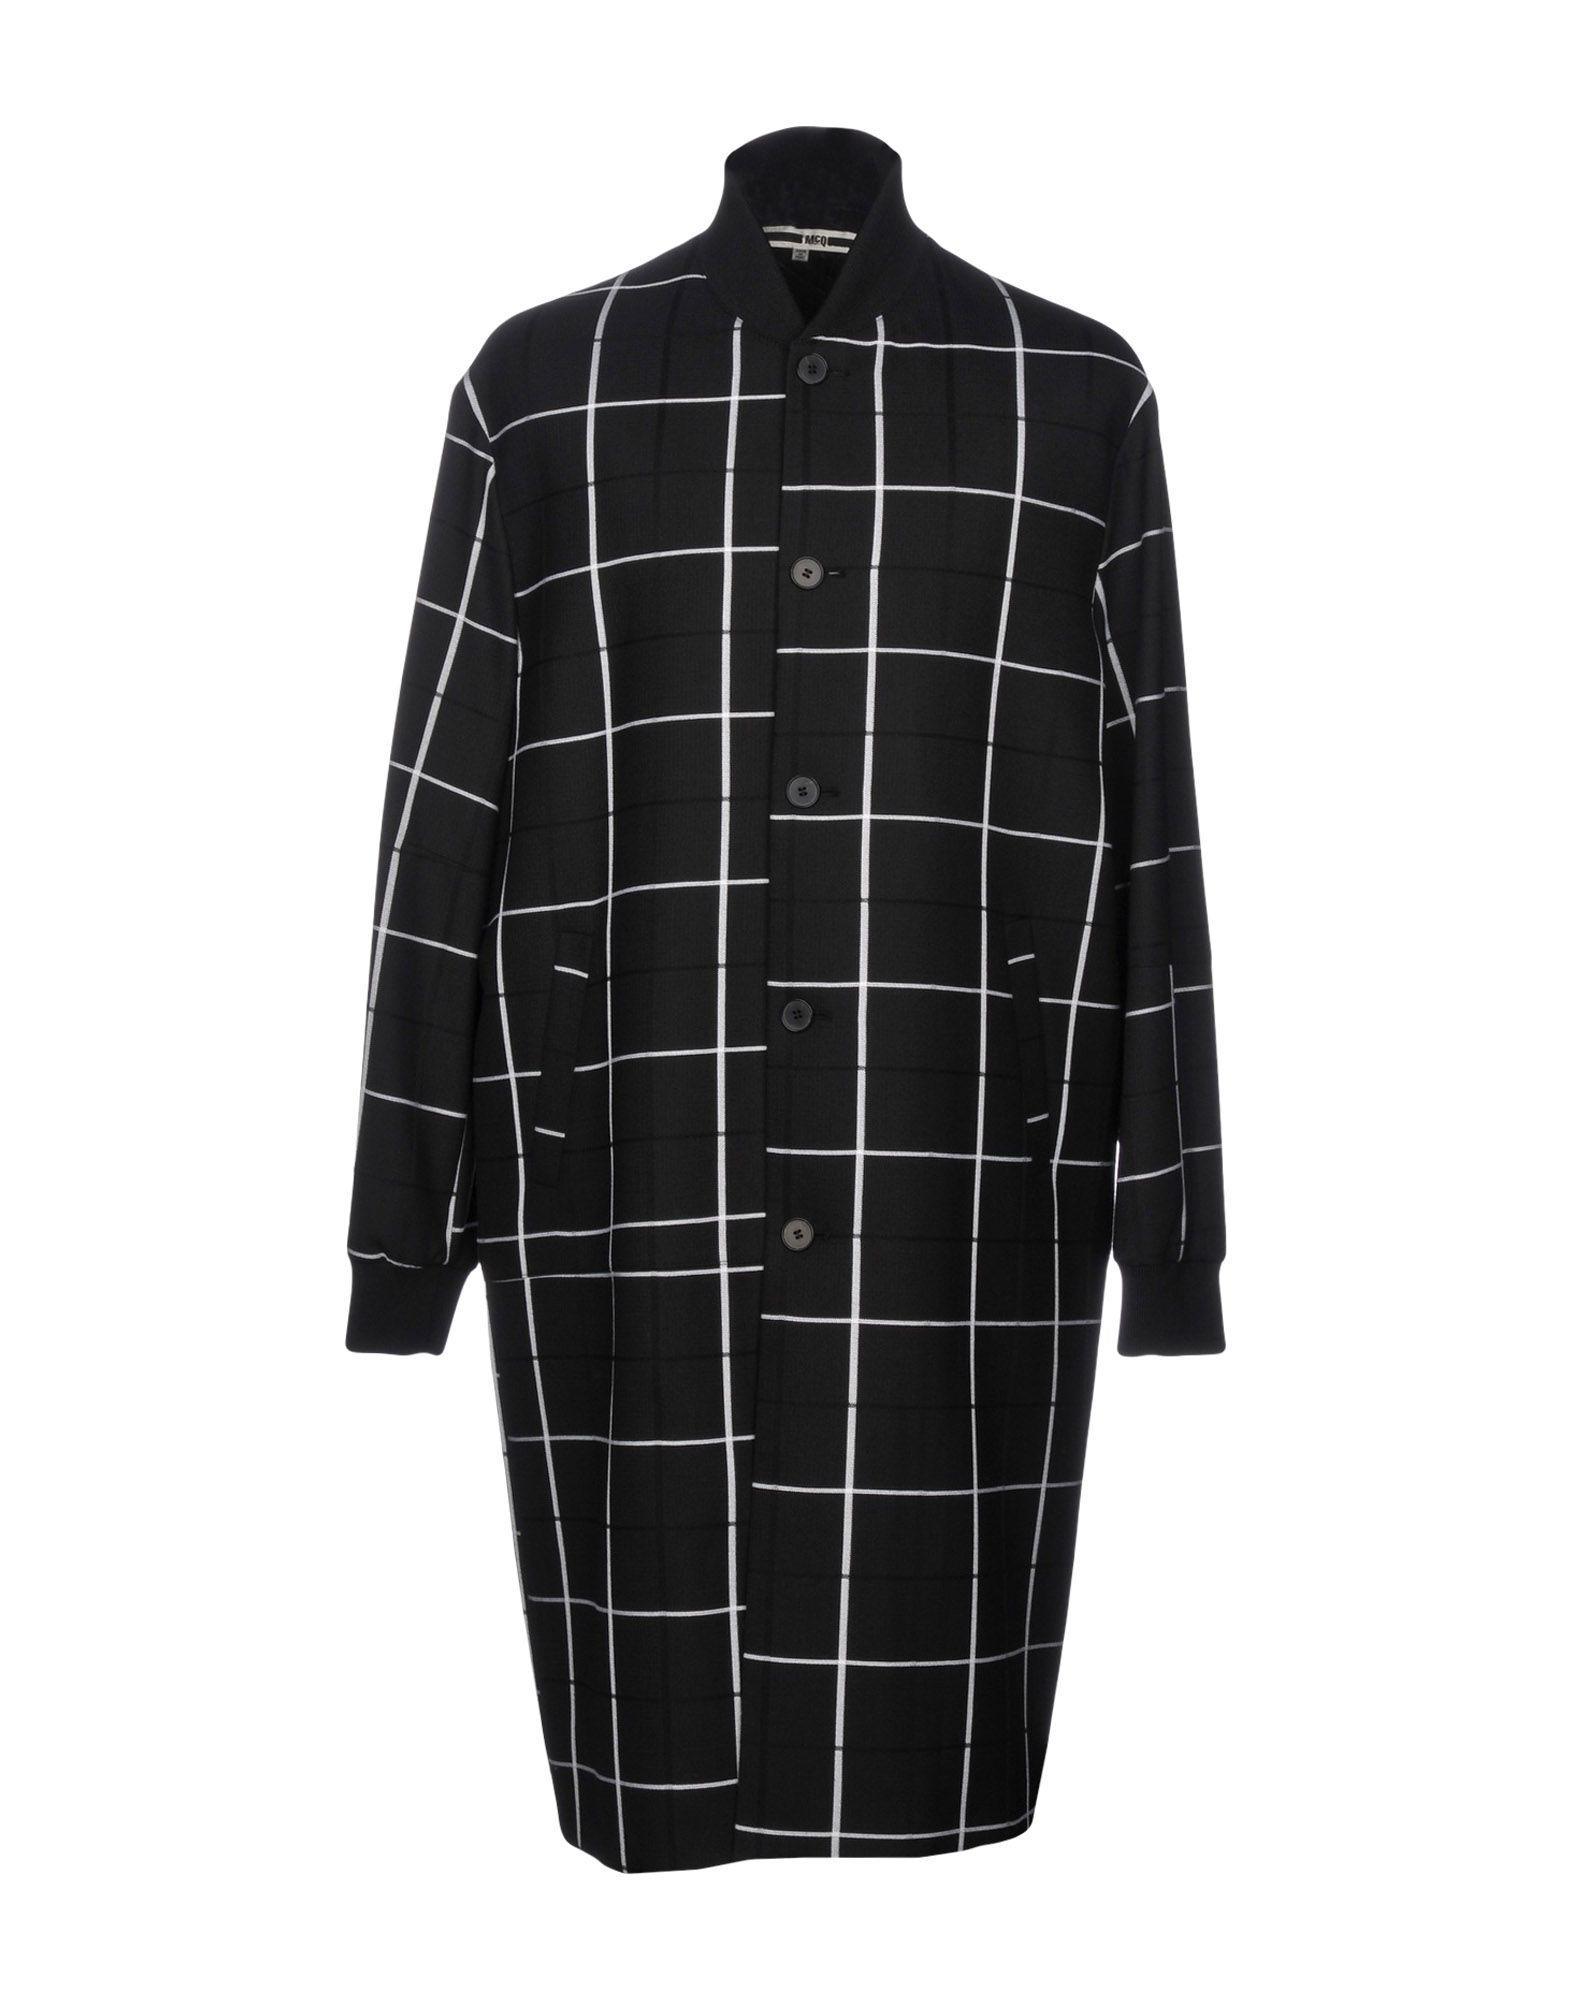 Mcq By Alexander Mcqueen Full-Length Jacket In Black